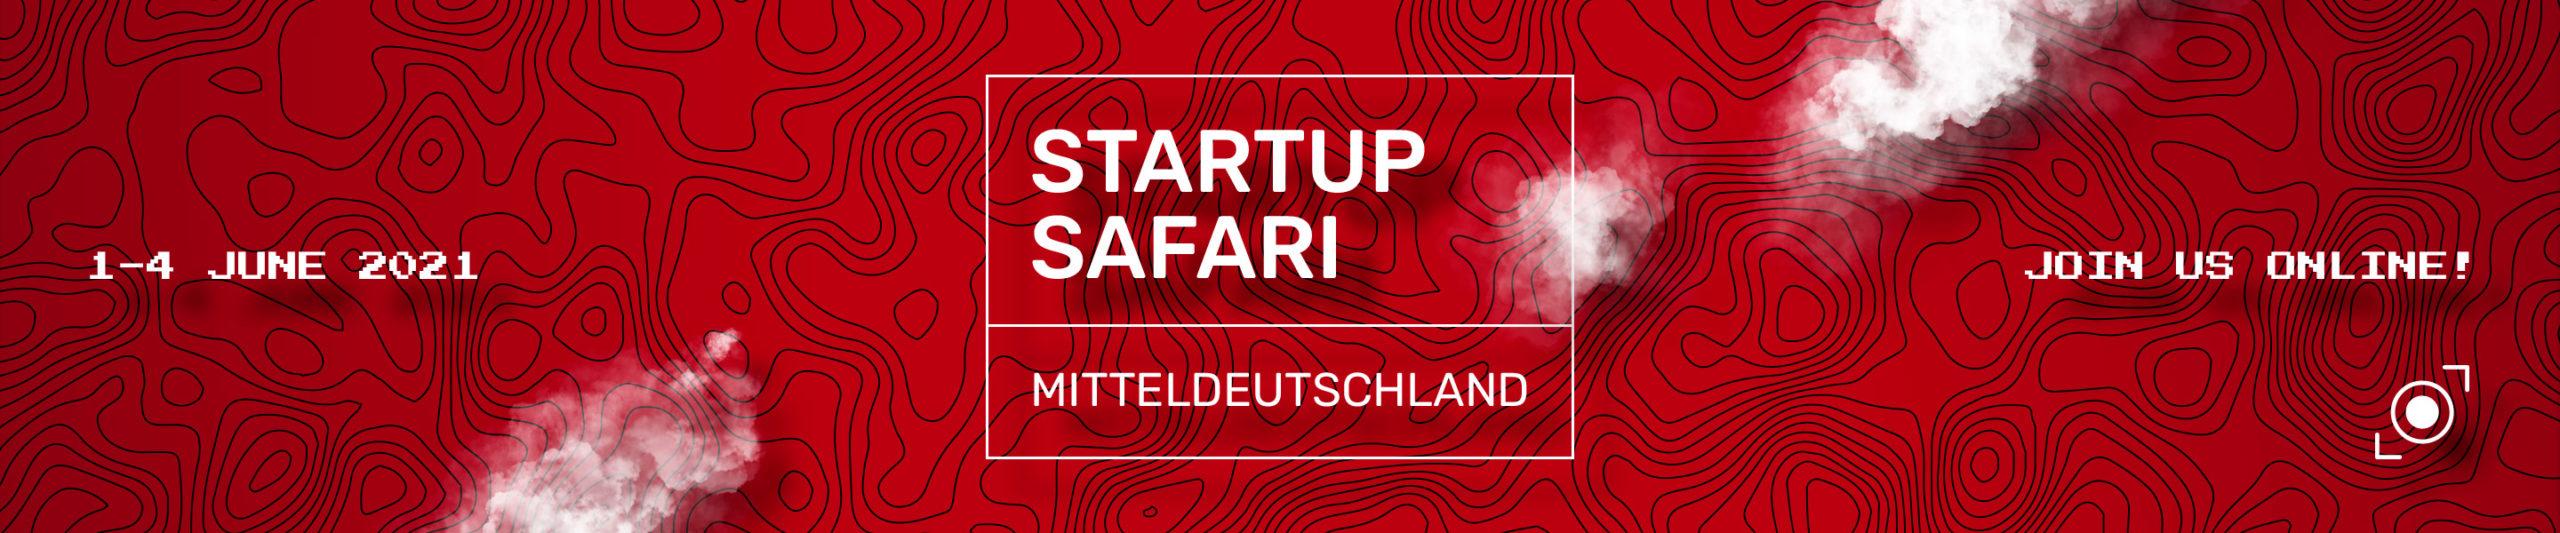 Banner - startup SAFARI Mitteldeutschland